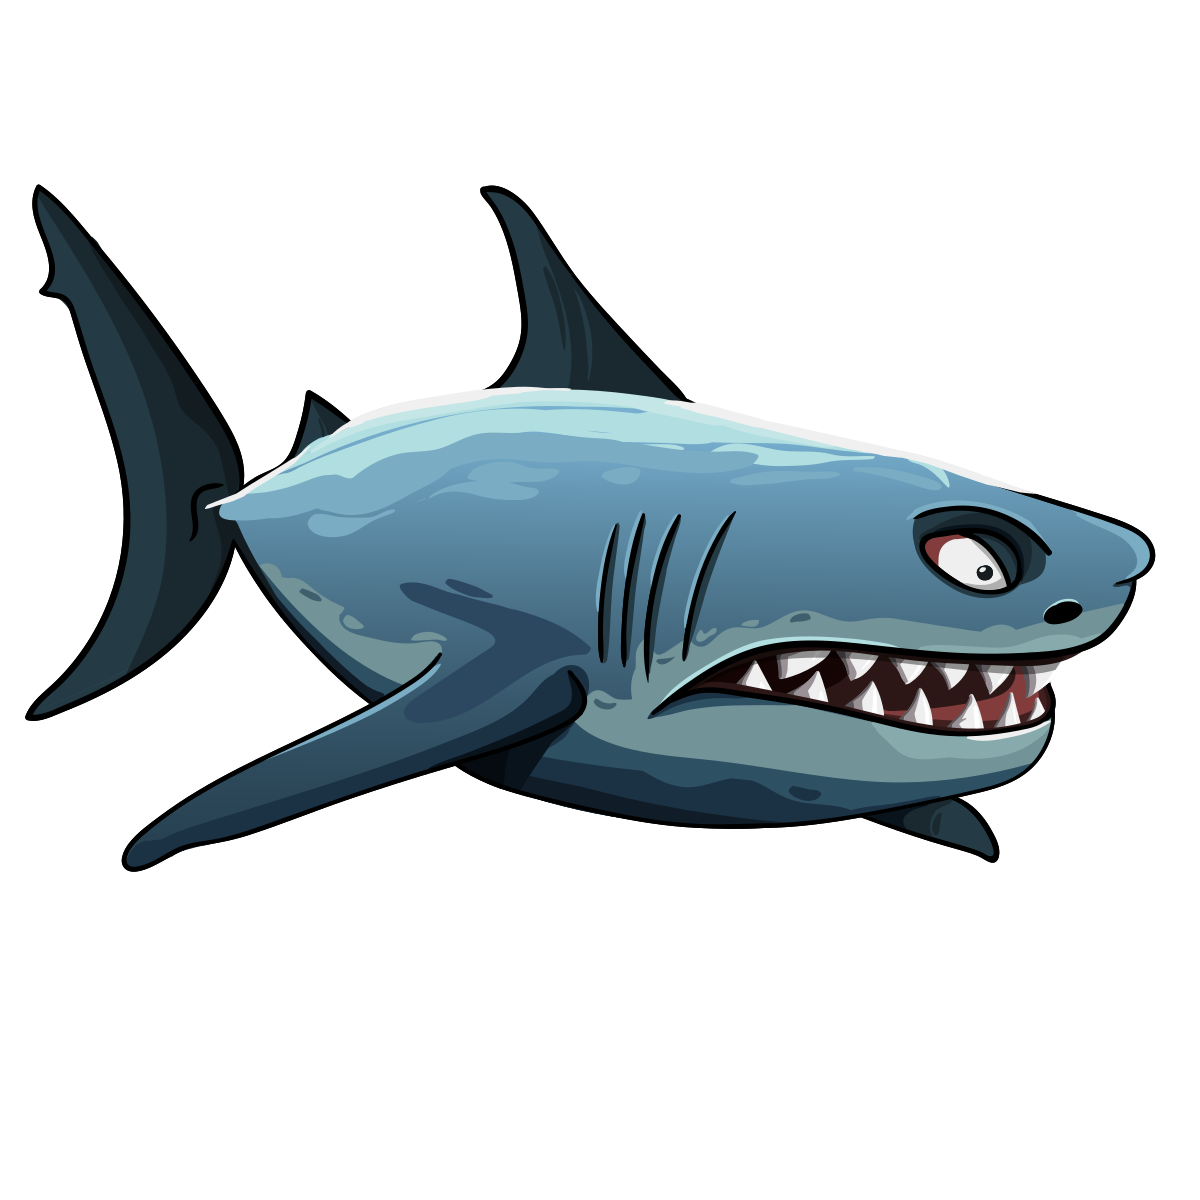 Angry shark clipart.